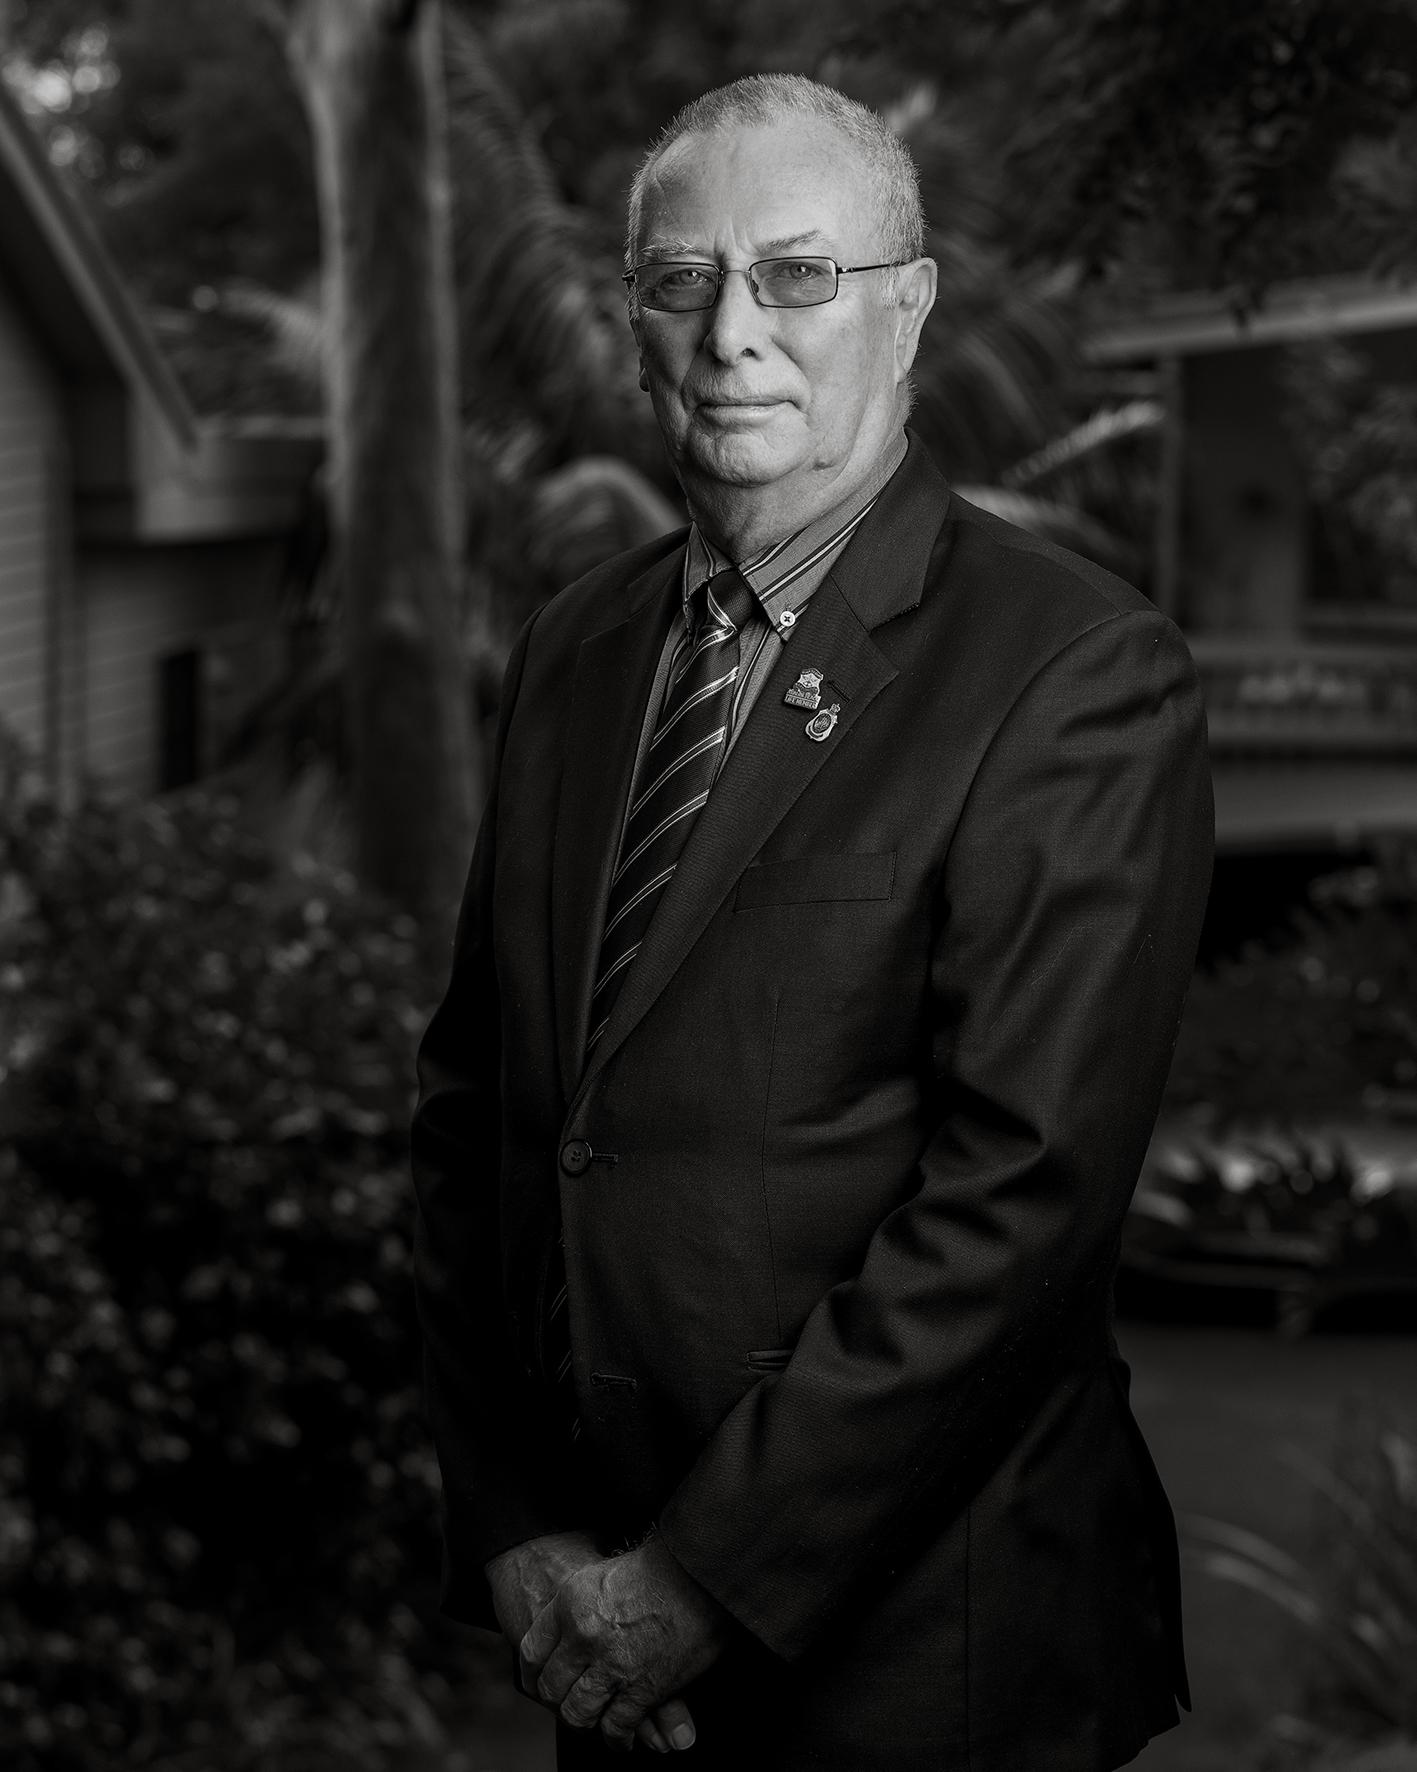 Robert Frederick White | 73 | Territorial Army - UK